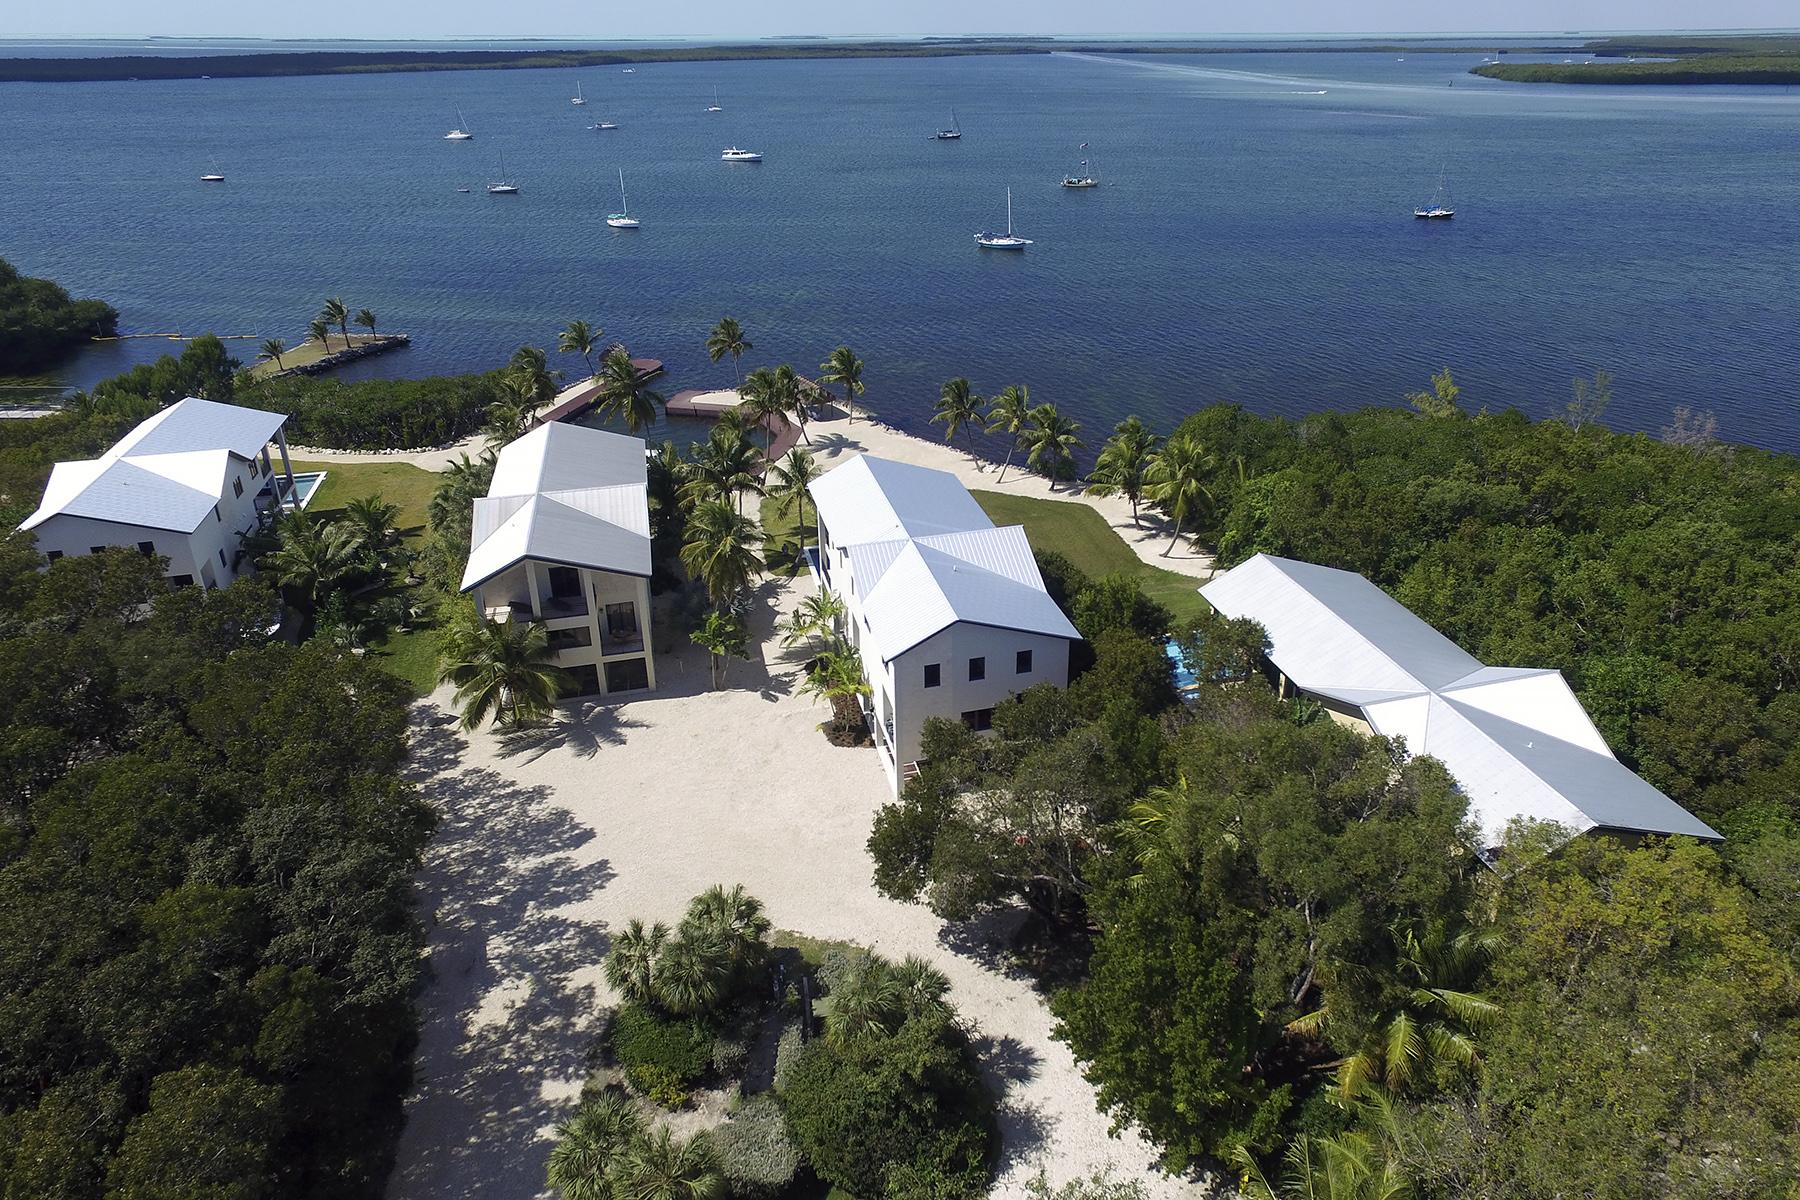 Additional photo for property listing at Exclusive Mahogany Bay - Florida Keys 101956 Overseas Highway Key Largo, Florida 33037 Hoa Kỳ